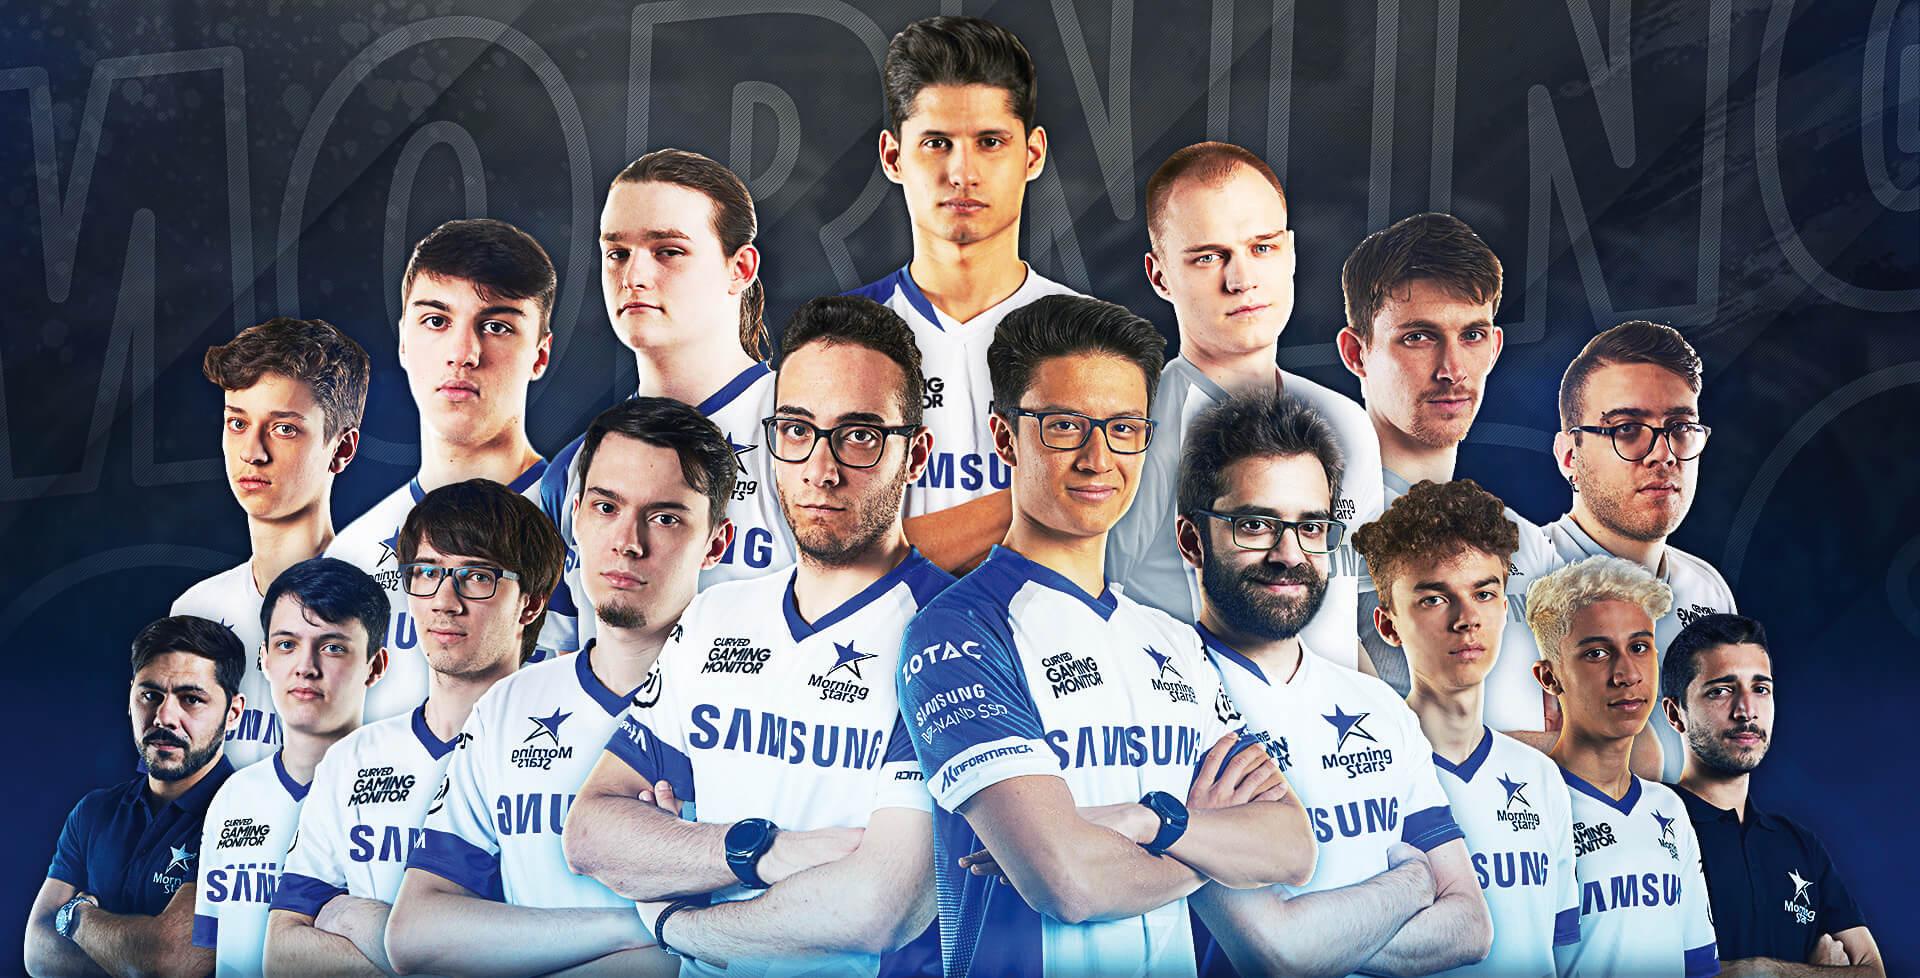 La squadra Samsung Morning Stars